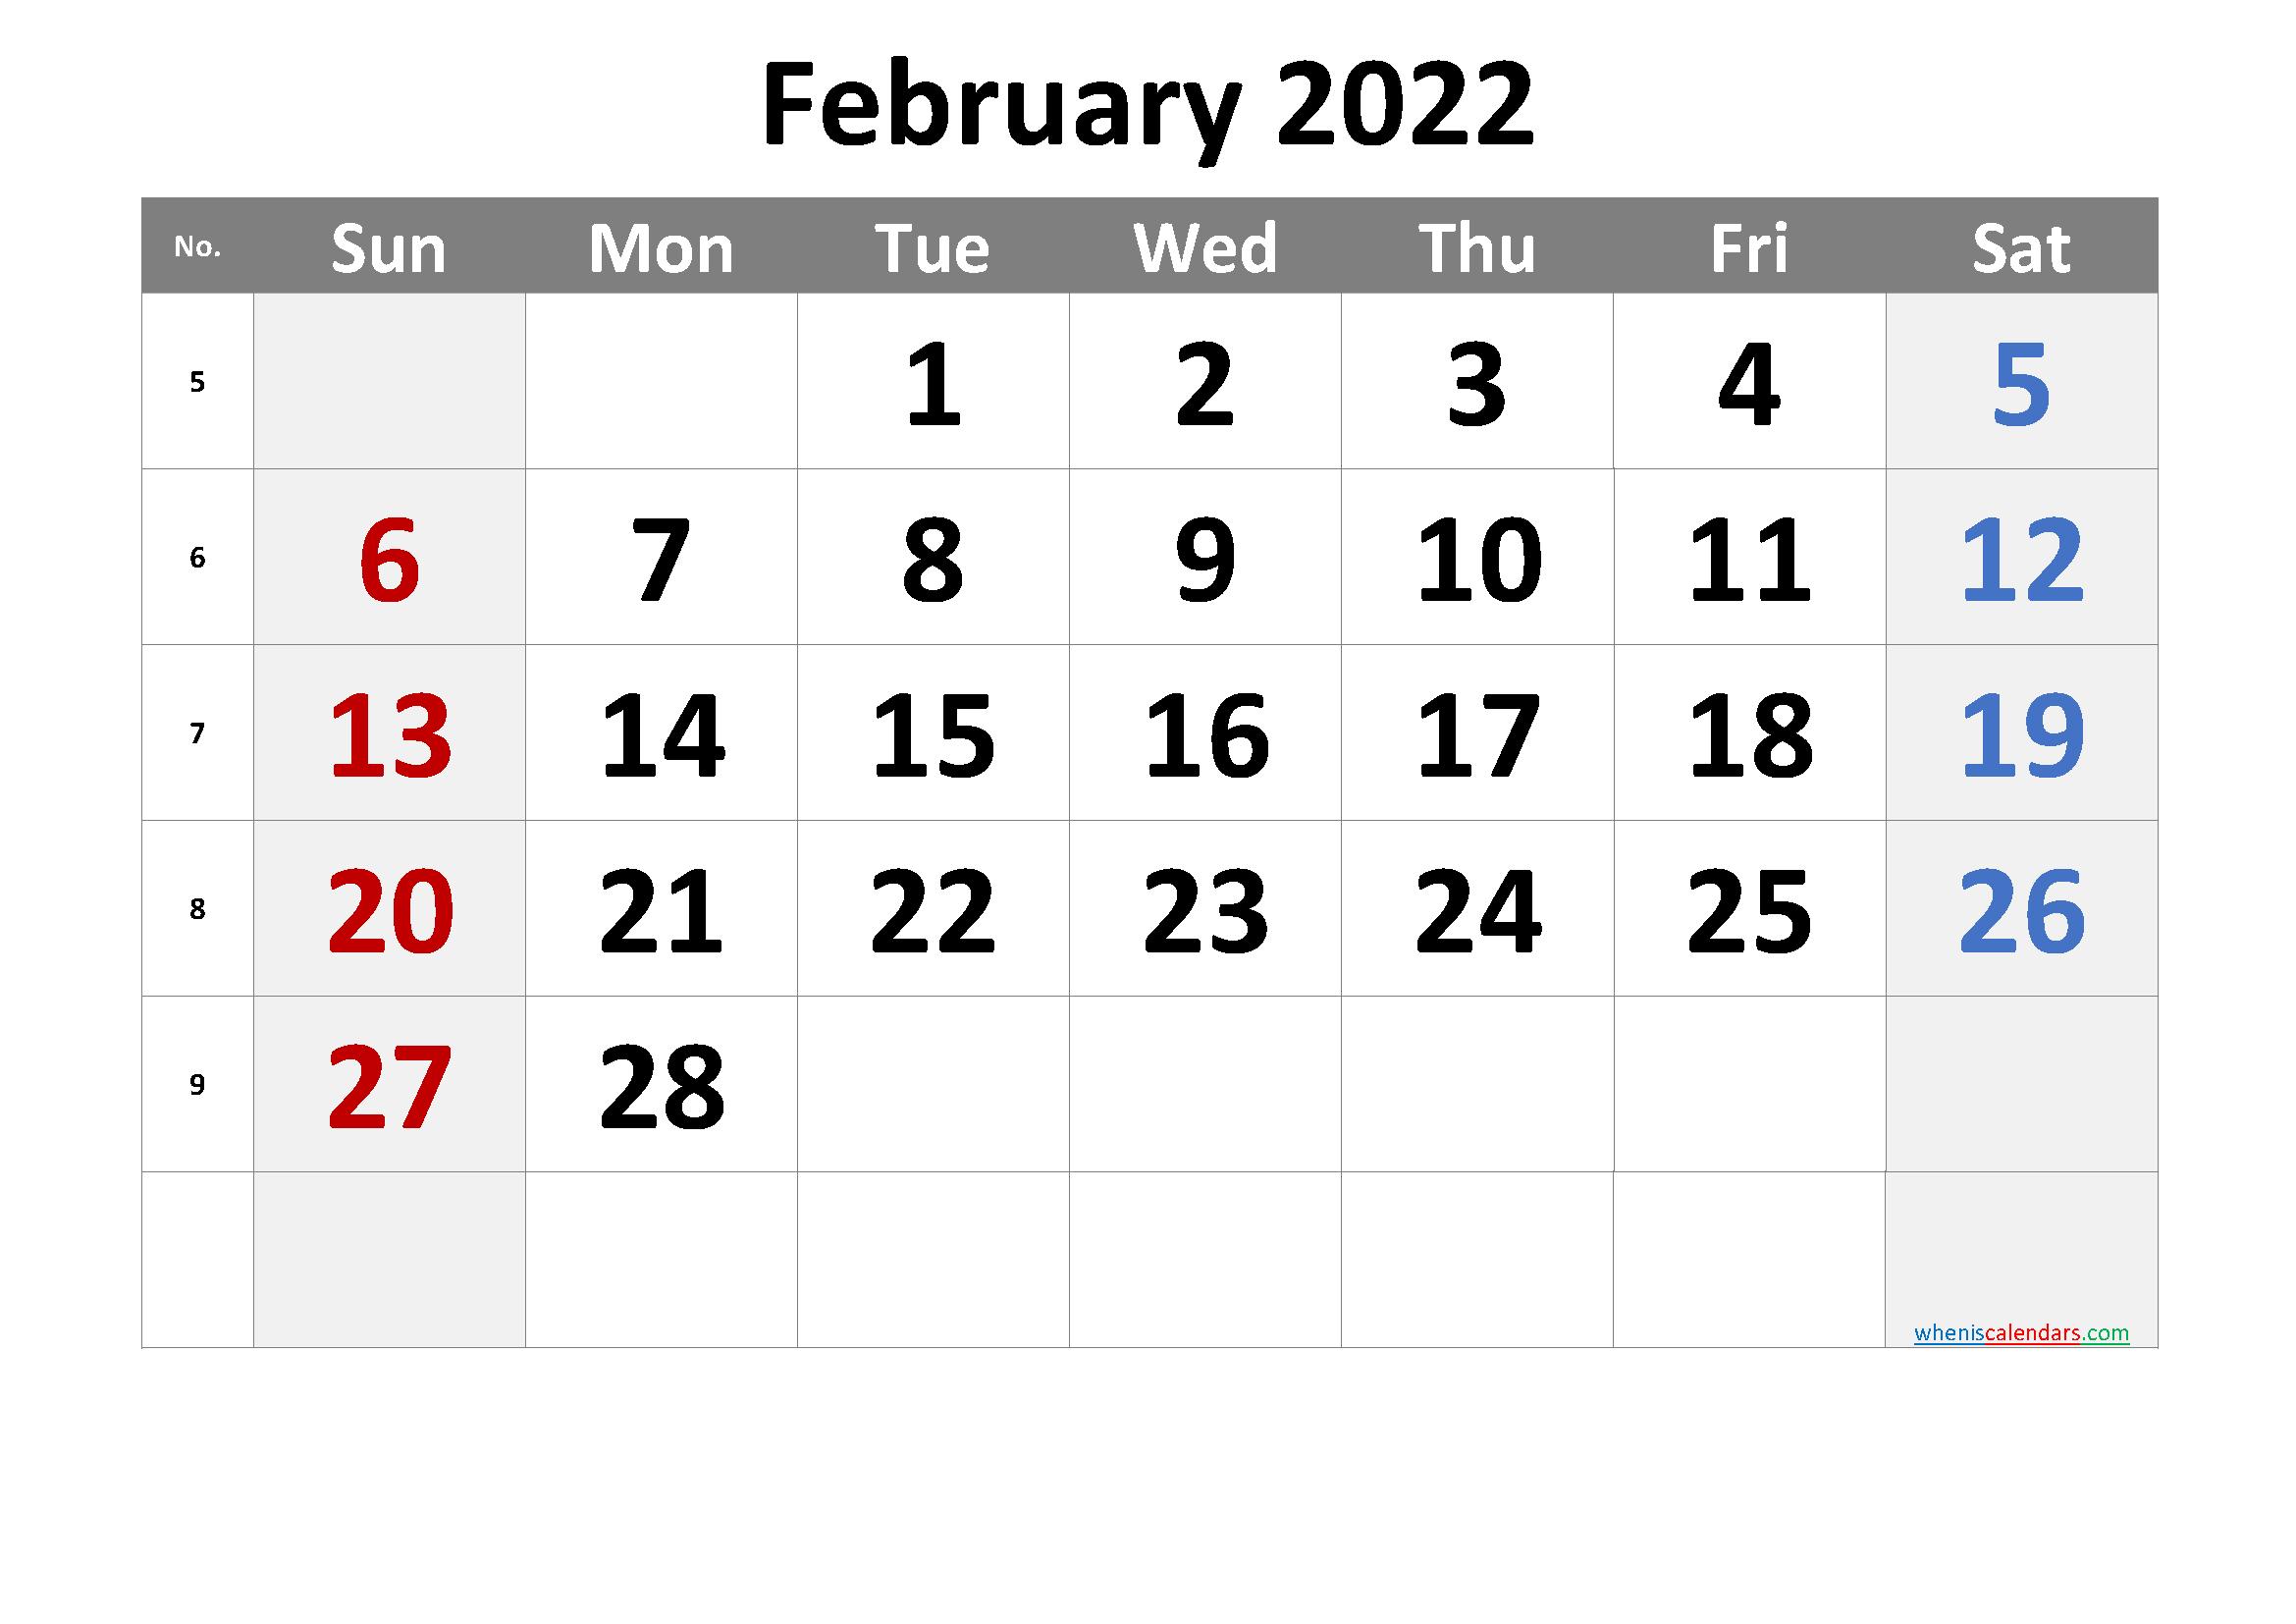 Calendar Template February 2022.February 2022 Printable Calendar With Week Numbers Free Premium Calendar Printables Printable Calendar Template Calendar Word